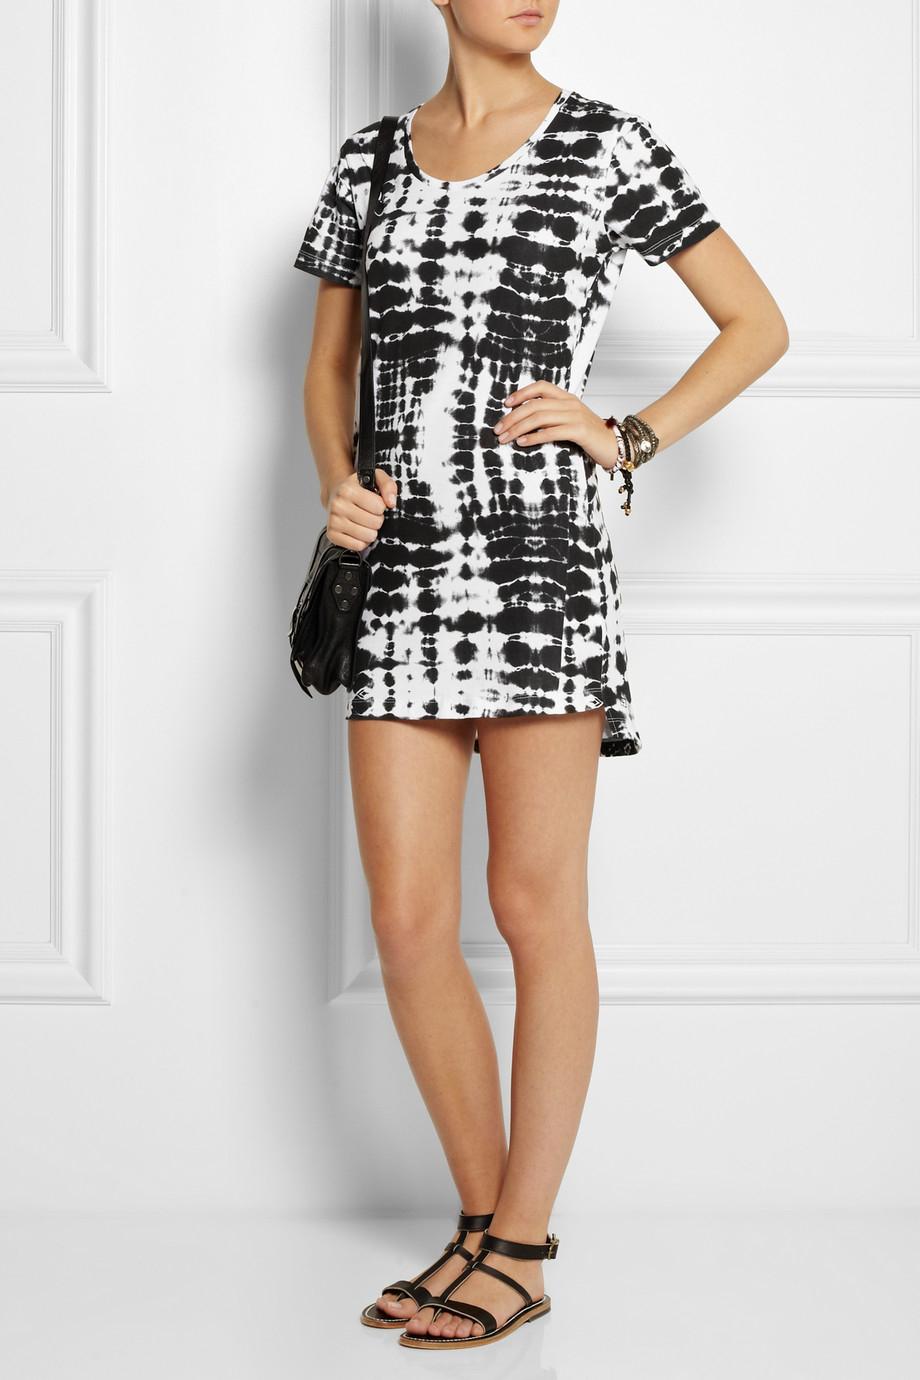 Lyst - Ksubi Xray Tie Dye Cotton Mini Dress in Black